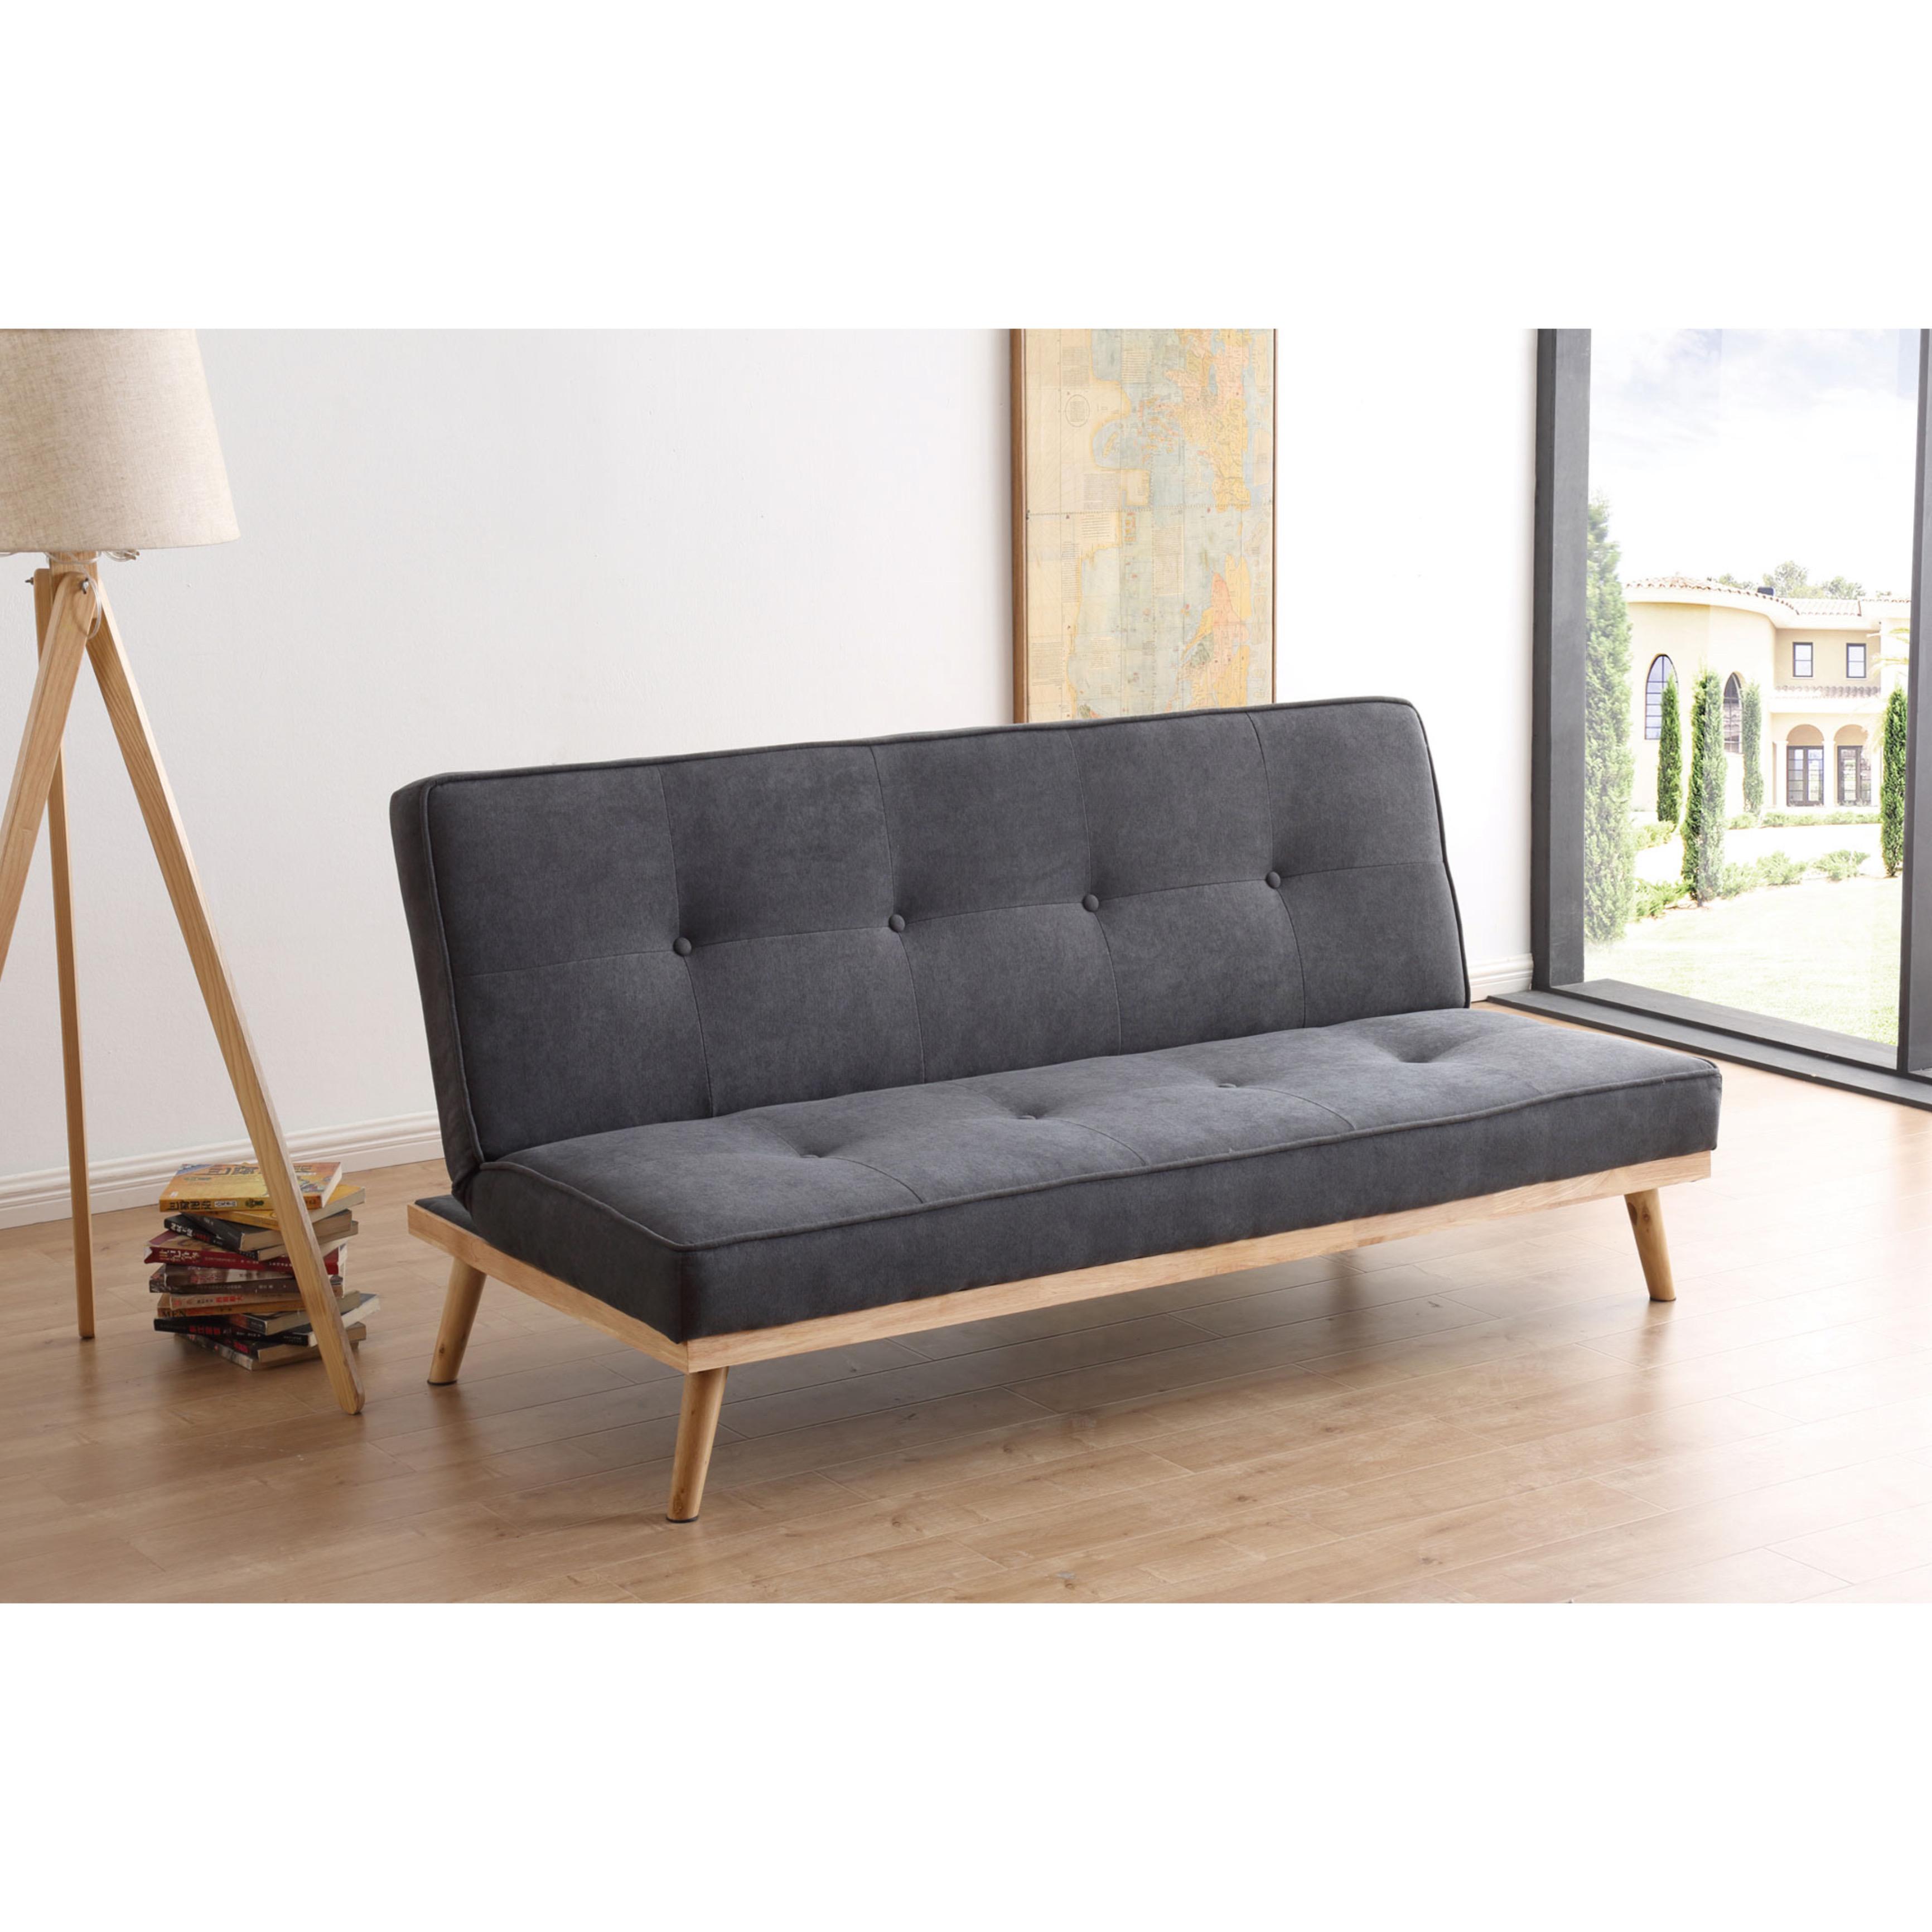 28441-sofa-cama-click-house-1.jpeg